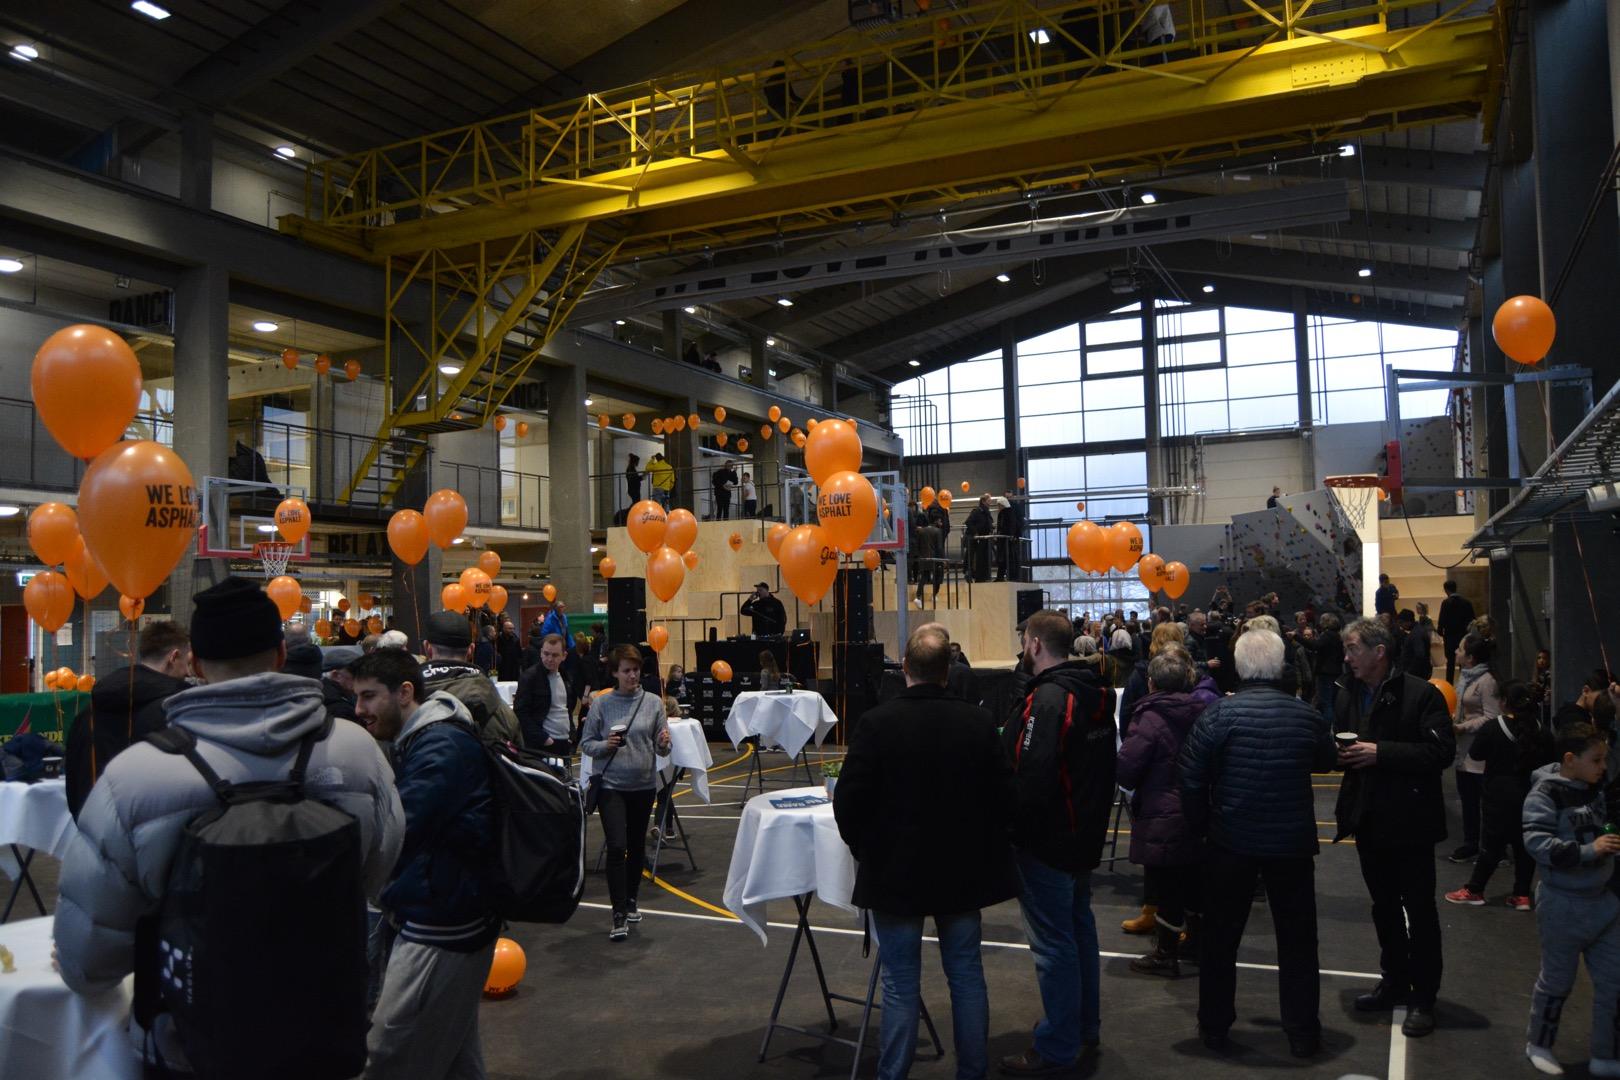 Aalborgs nye gigantiske Streetmekka: Se billederne fra åbningen